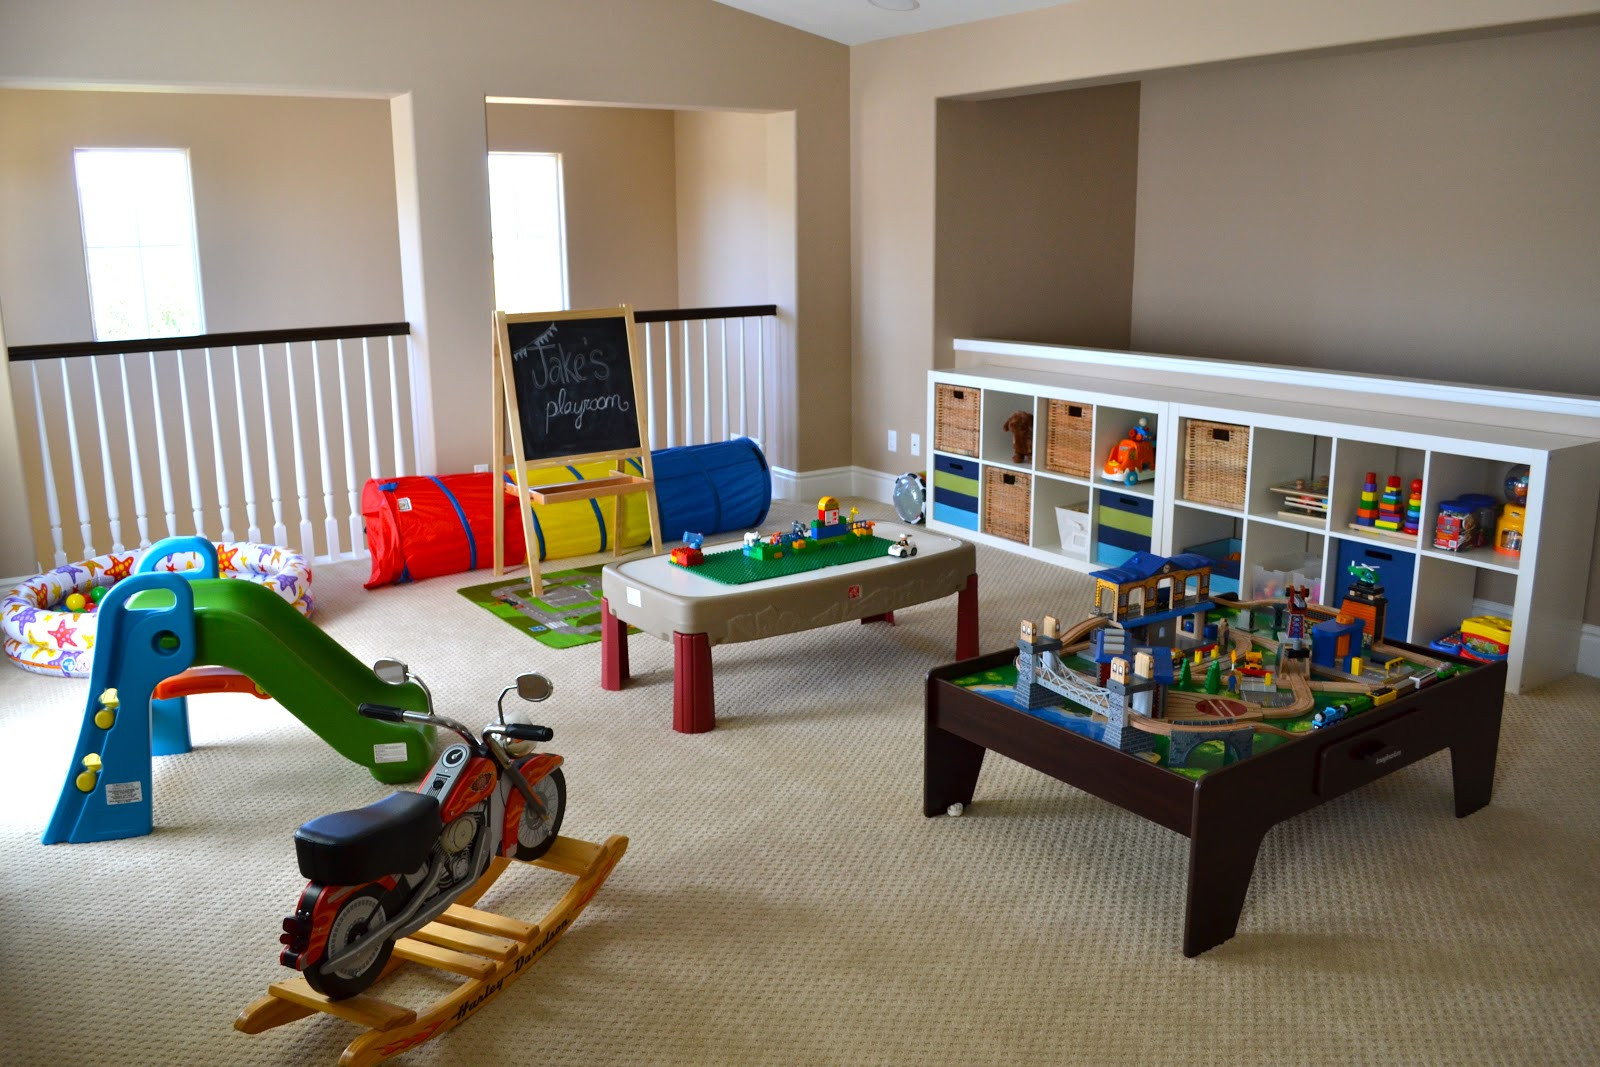 Kids Game Room Furniture  Kids Playroom Decorating Ideas – lifestyle tweets